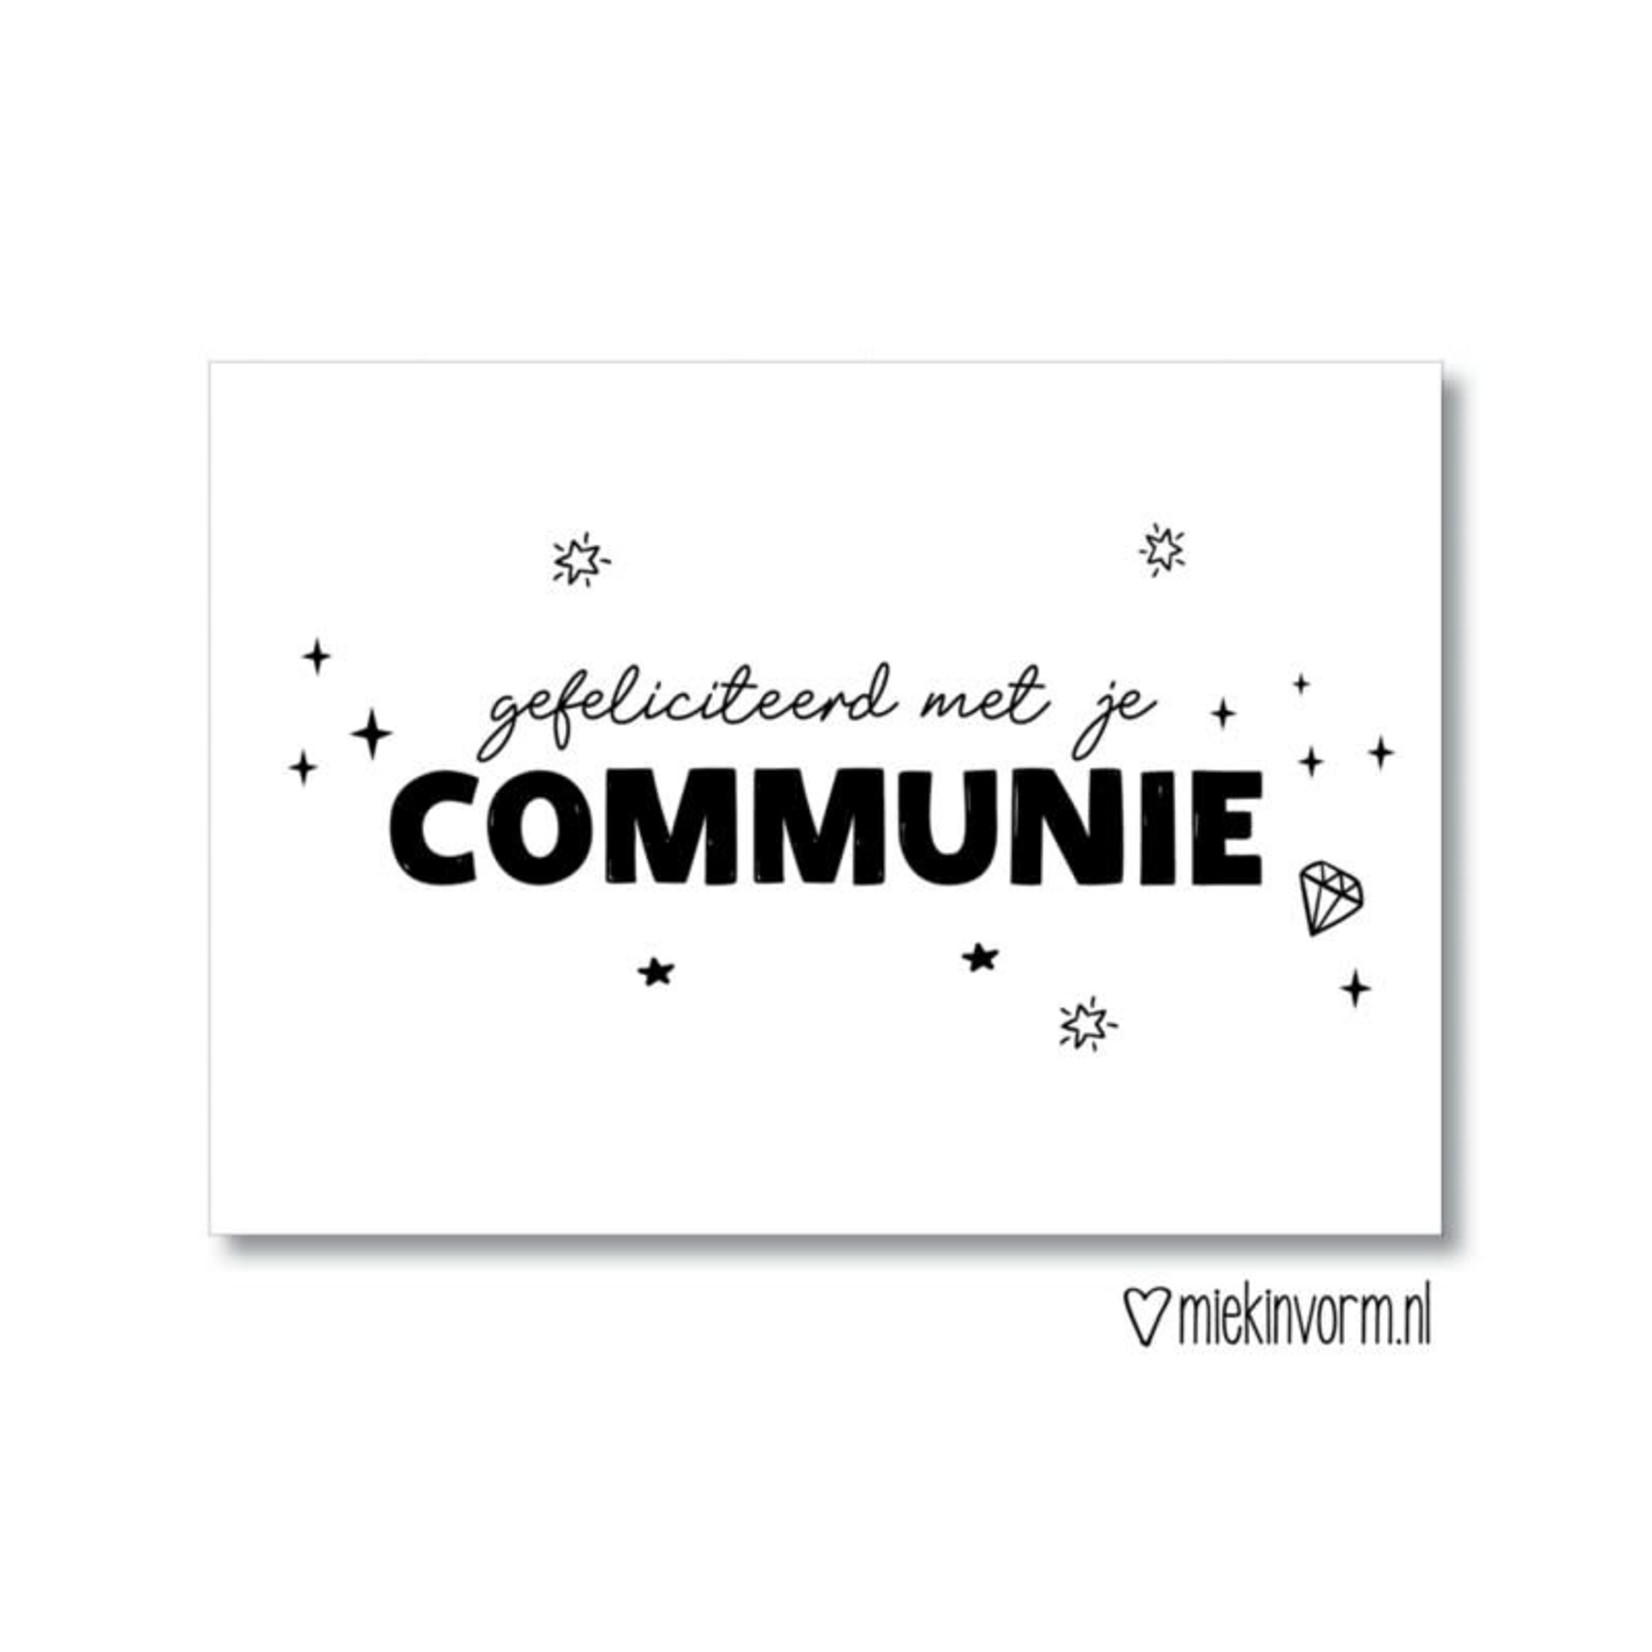 MIEKinvorm Ansichtkaart Gefeliciteerd met je communie